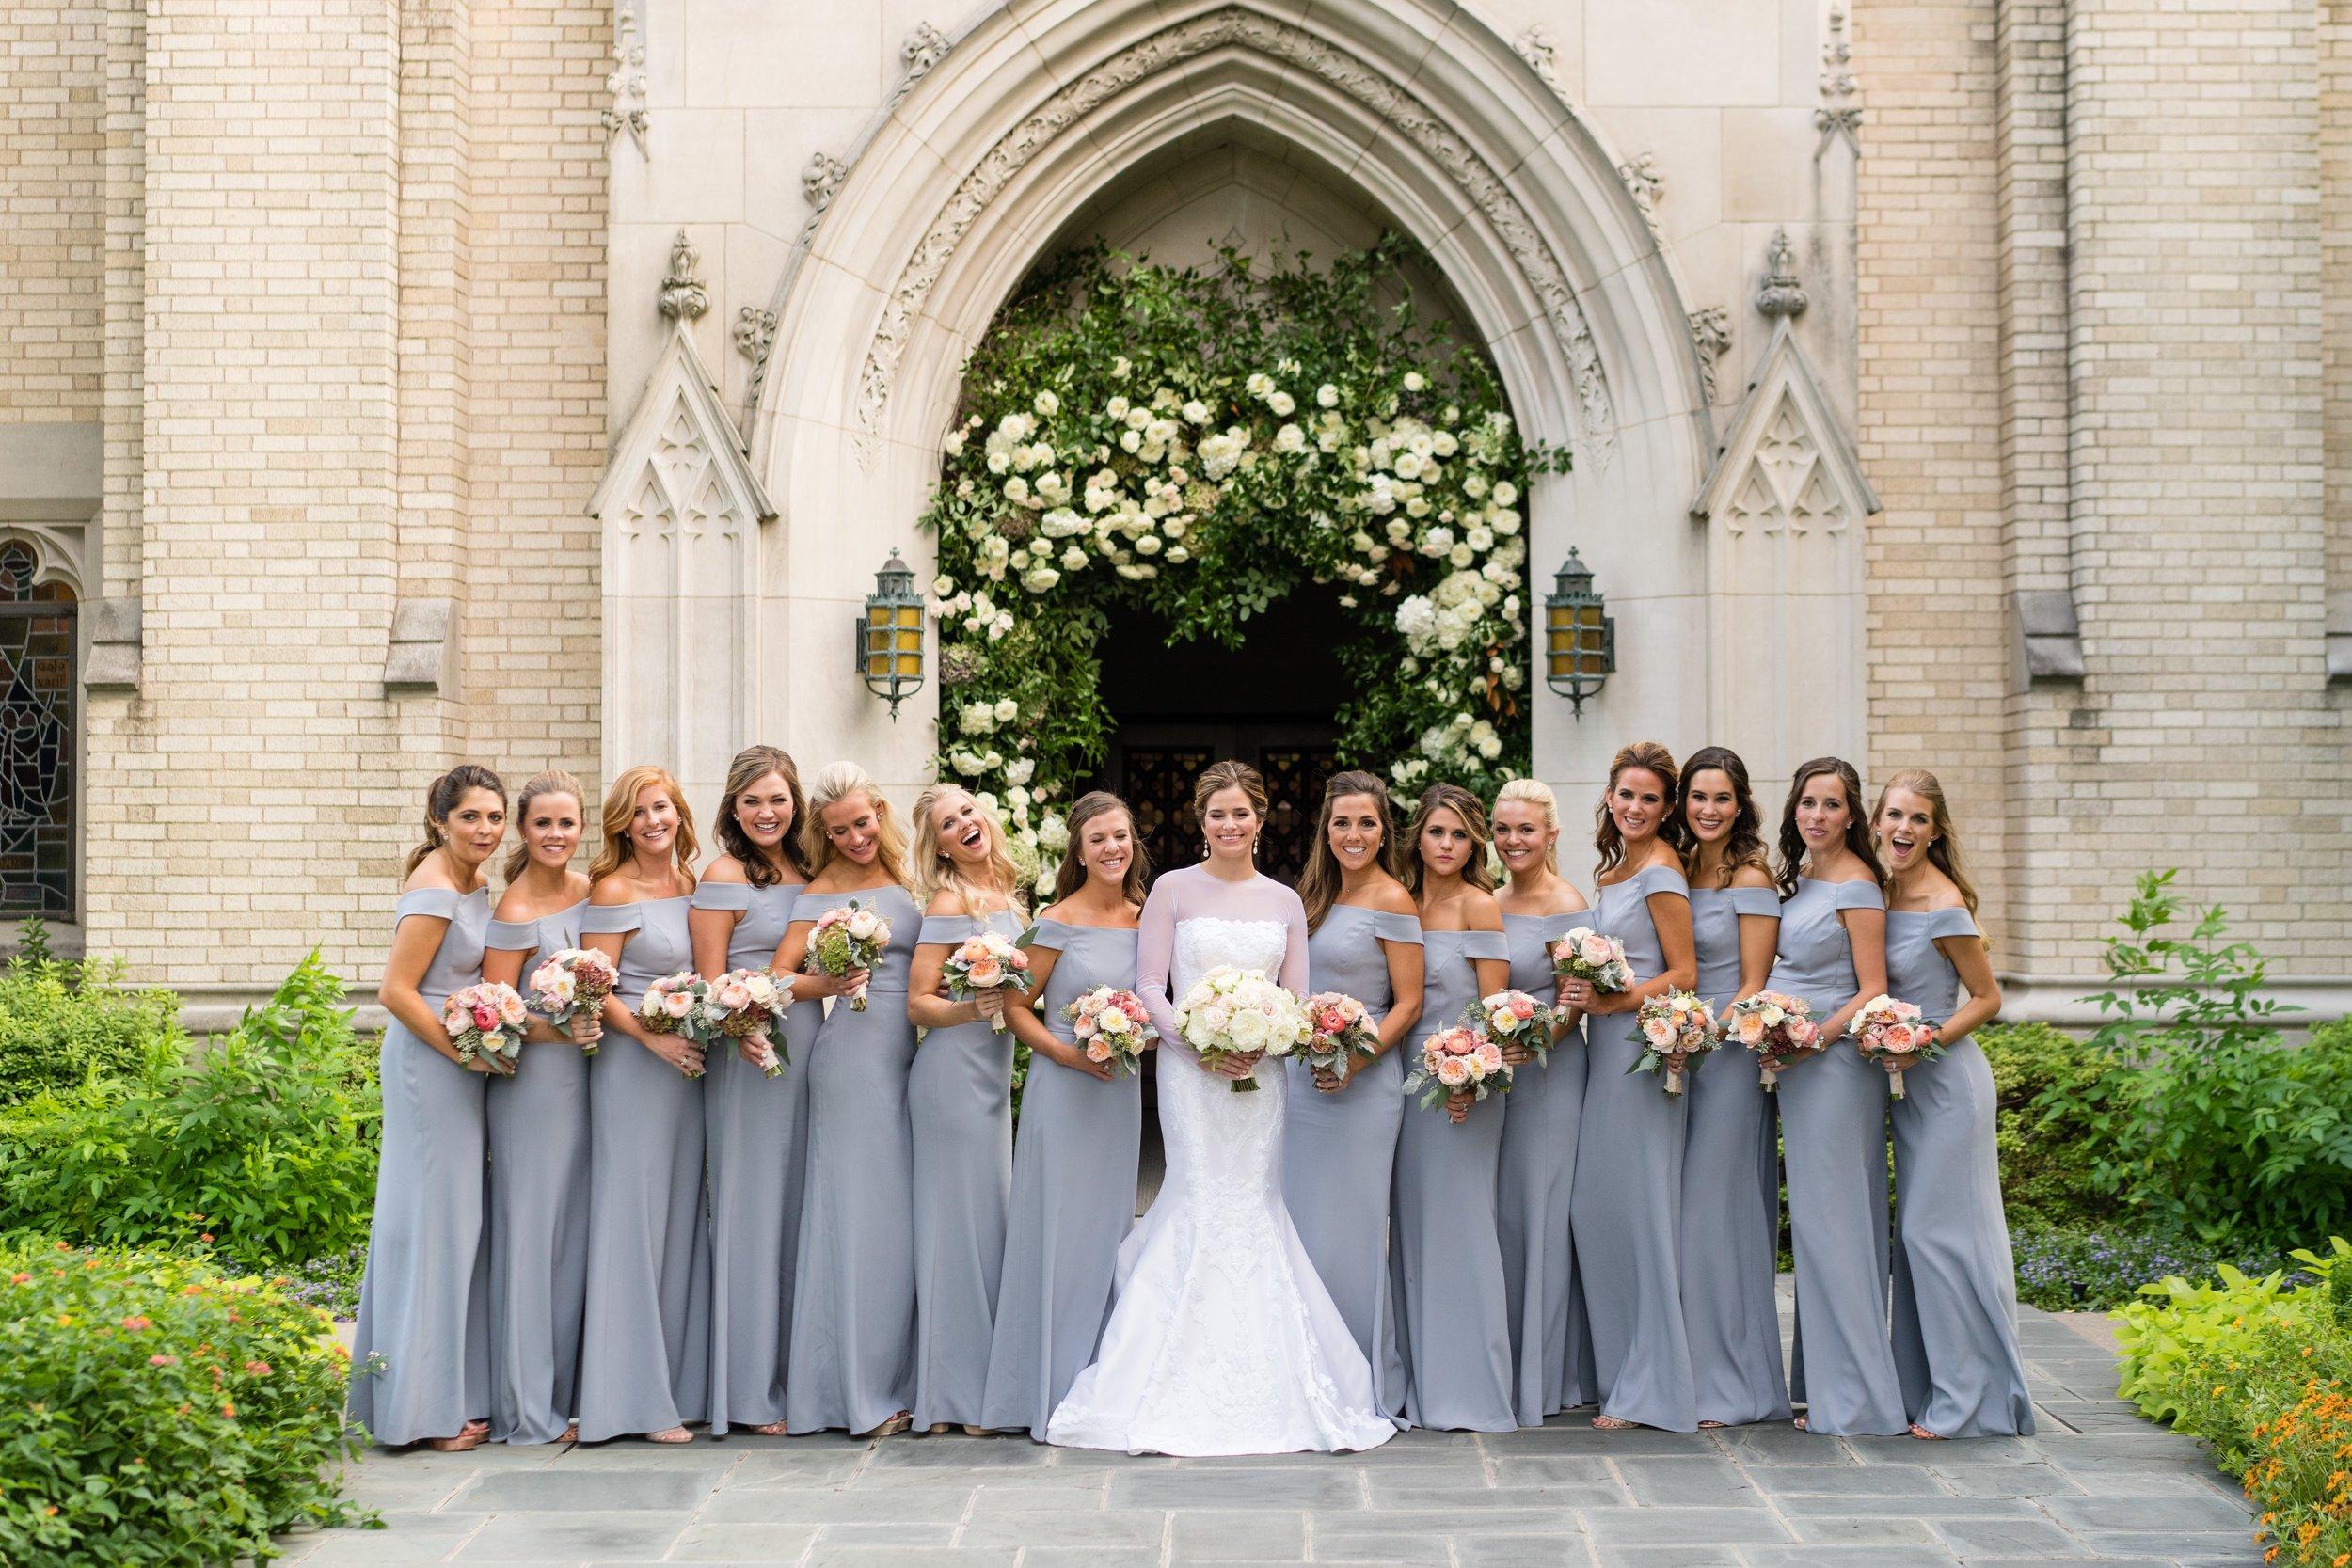 Bridesmaid Details - Dallas, Tx - Fall Wedding - Julian Leaver Events